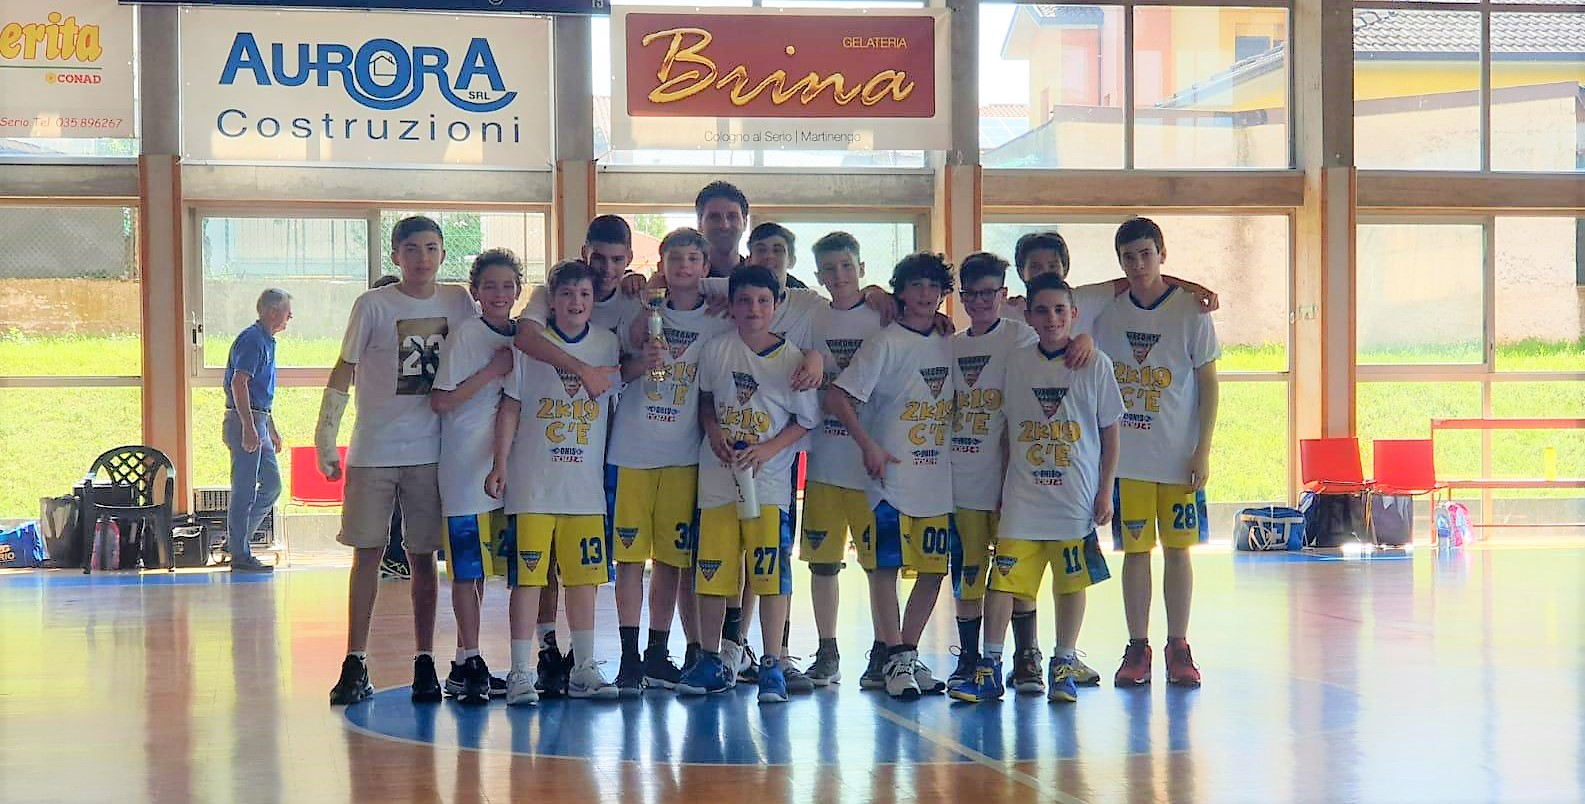 FINAL FOUR COPPA BERGAMO U13M